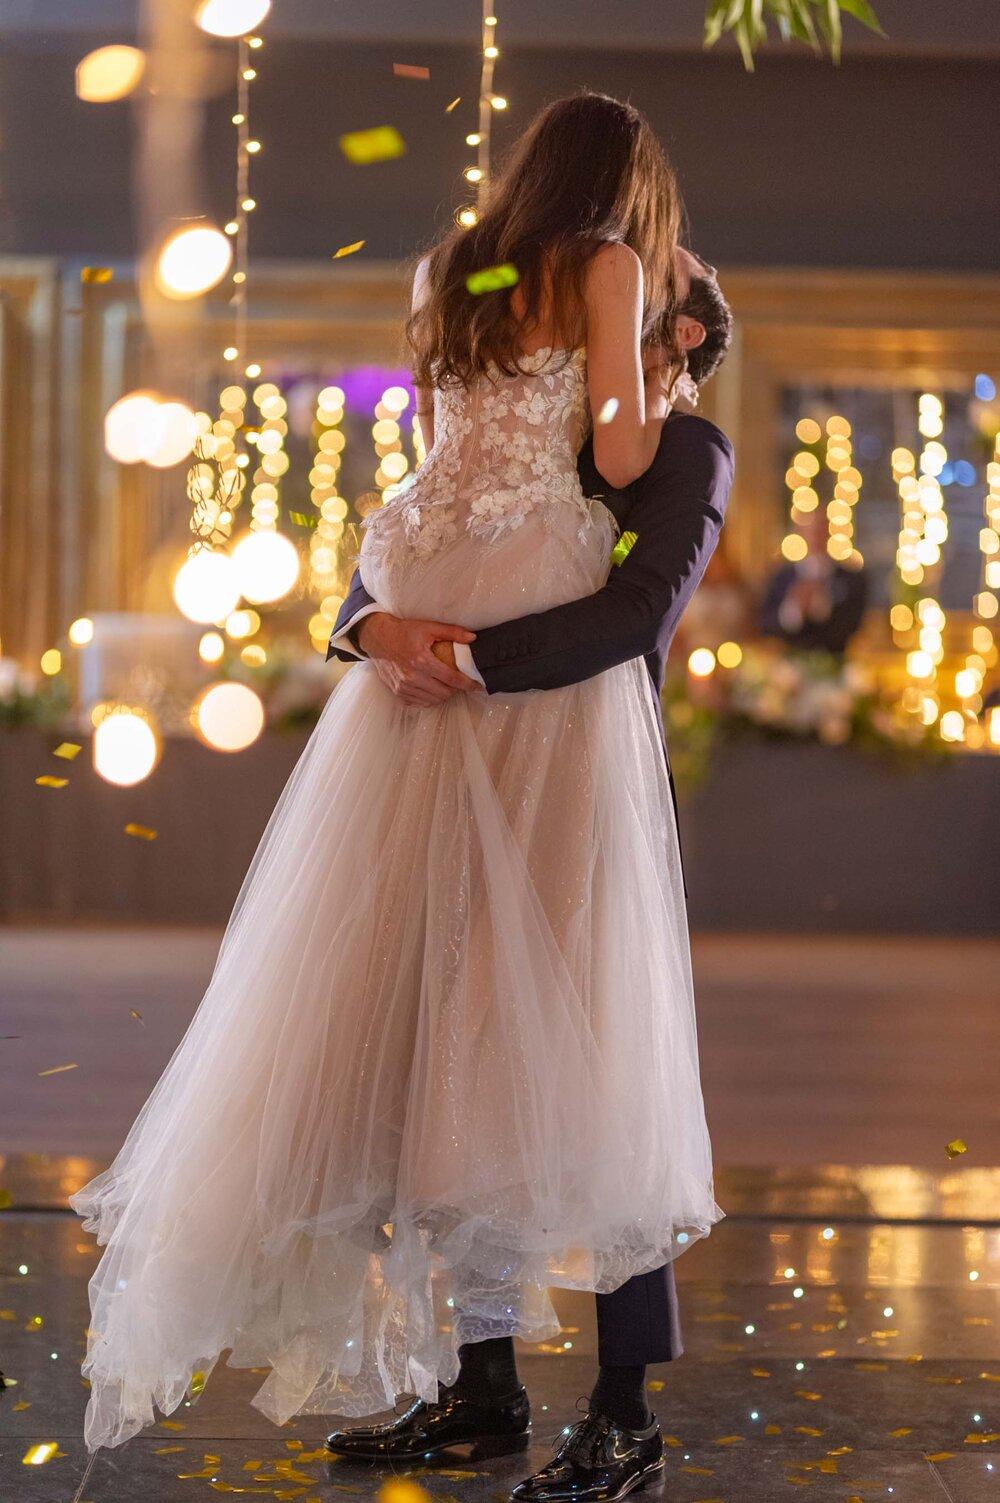 cape-town-wedding-photographer-john-henry-bartlett-sachhs-wedding-001.jpg